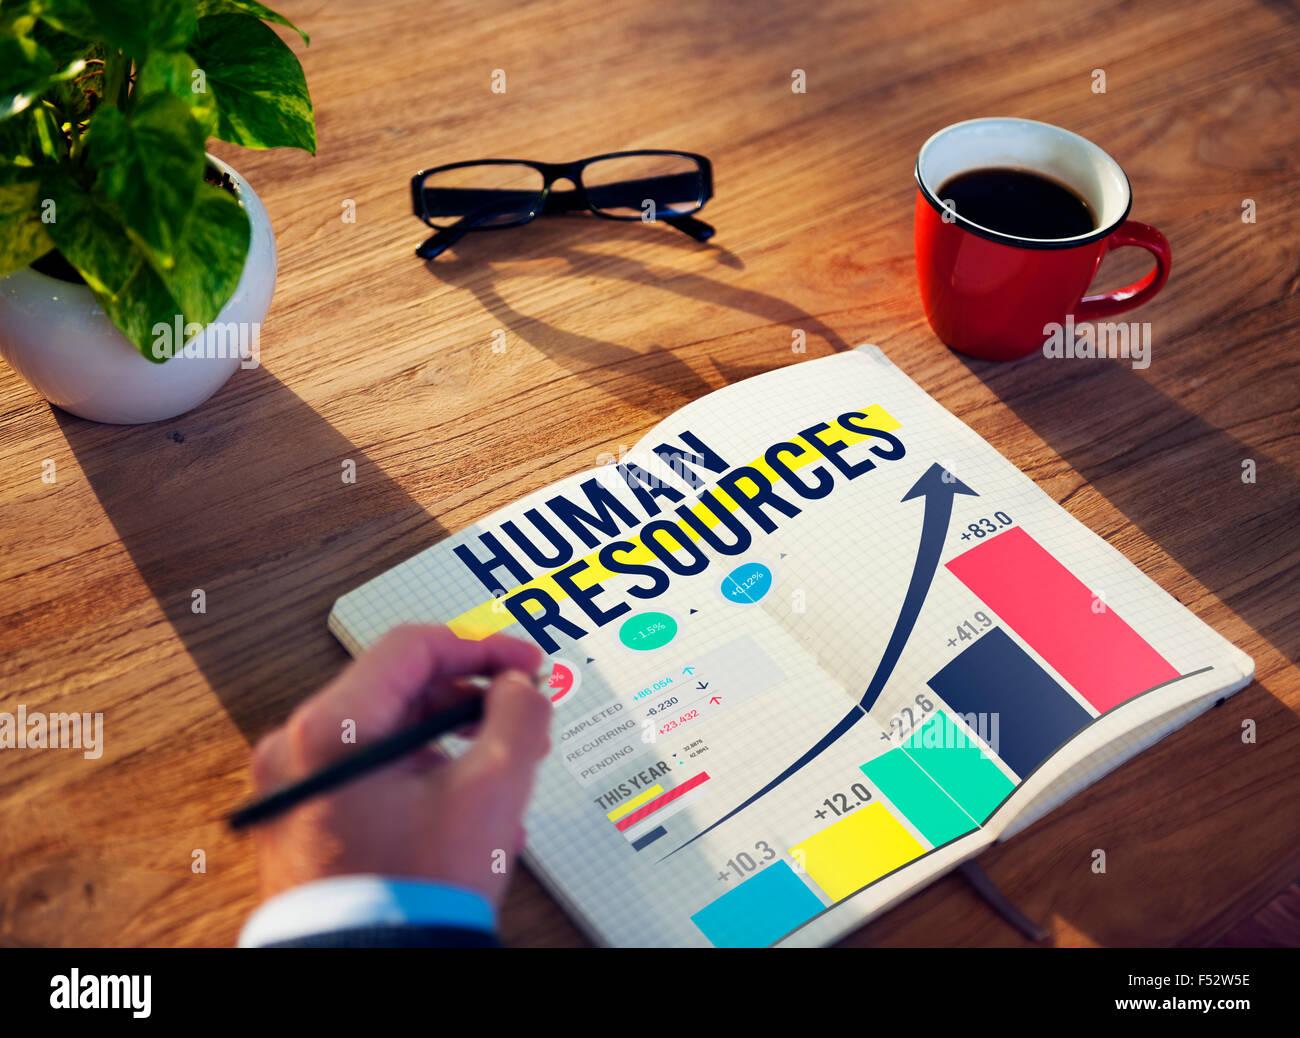 Human Resources Hiring Job Accupation Concept Stock Photo